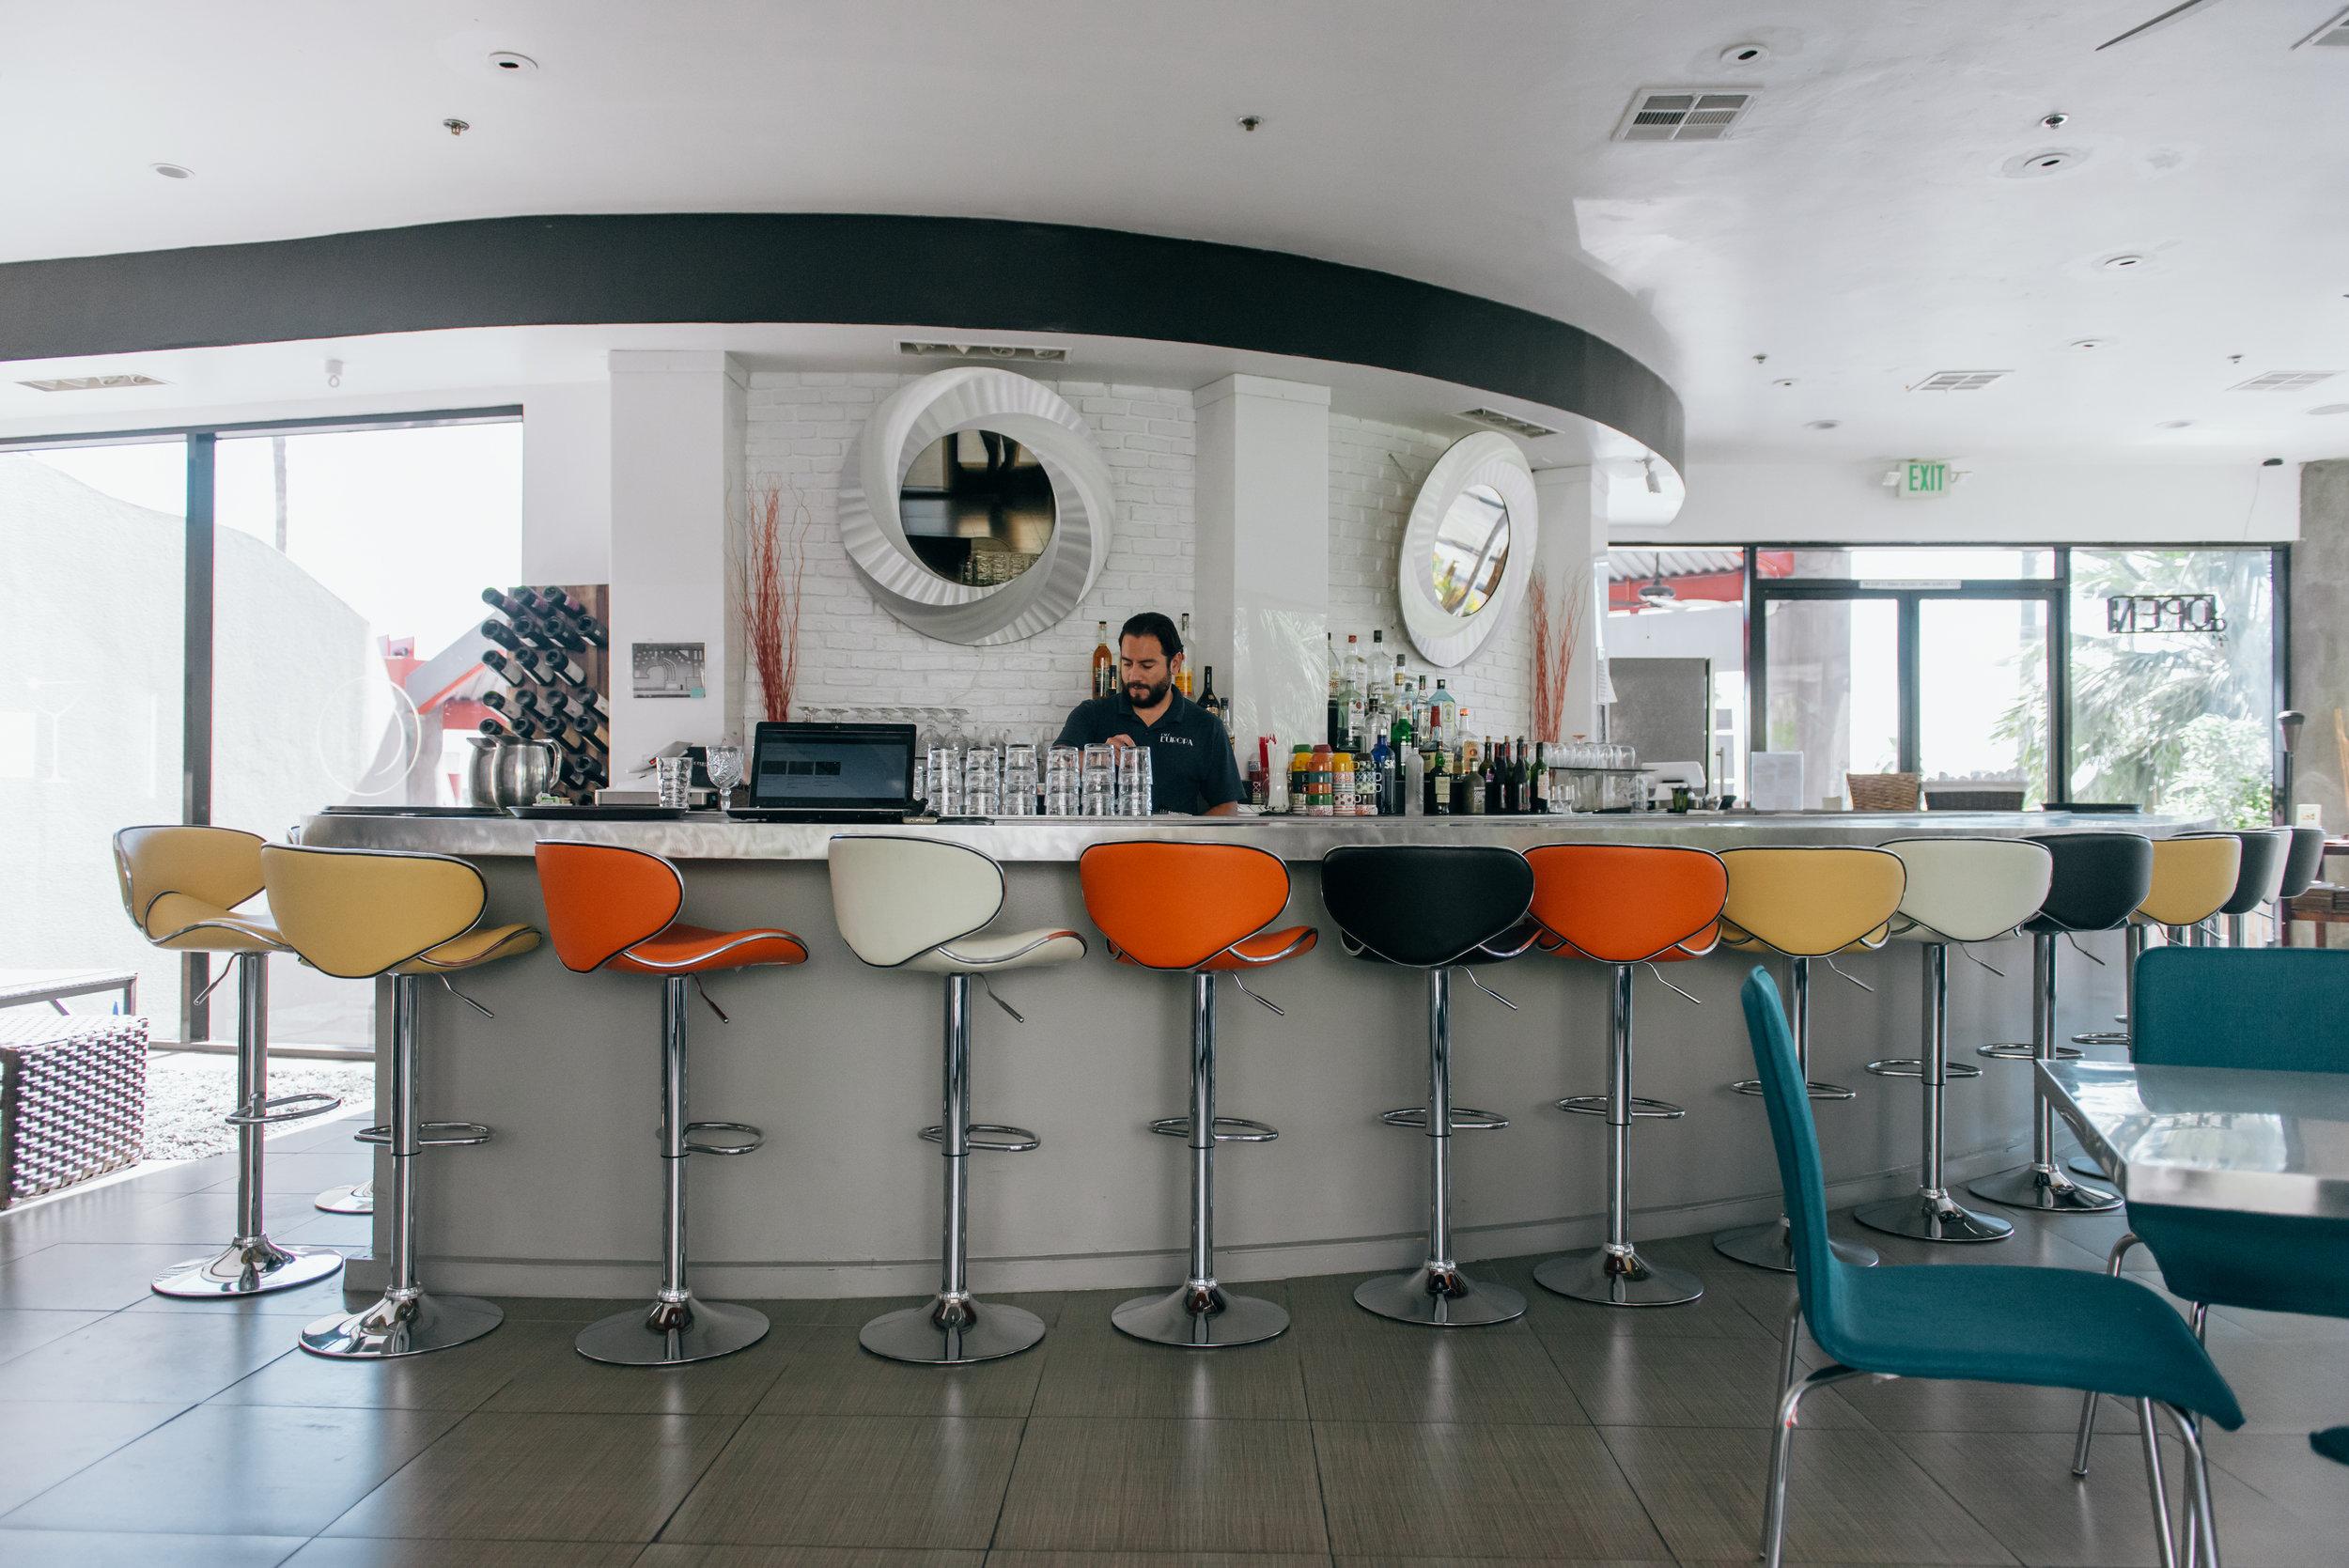 CAFE EUROPA - MEDITERRANEAN